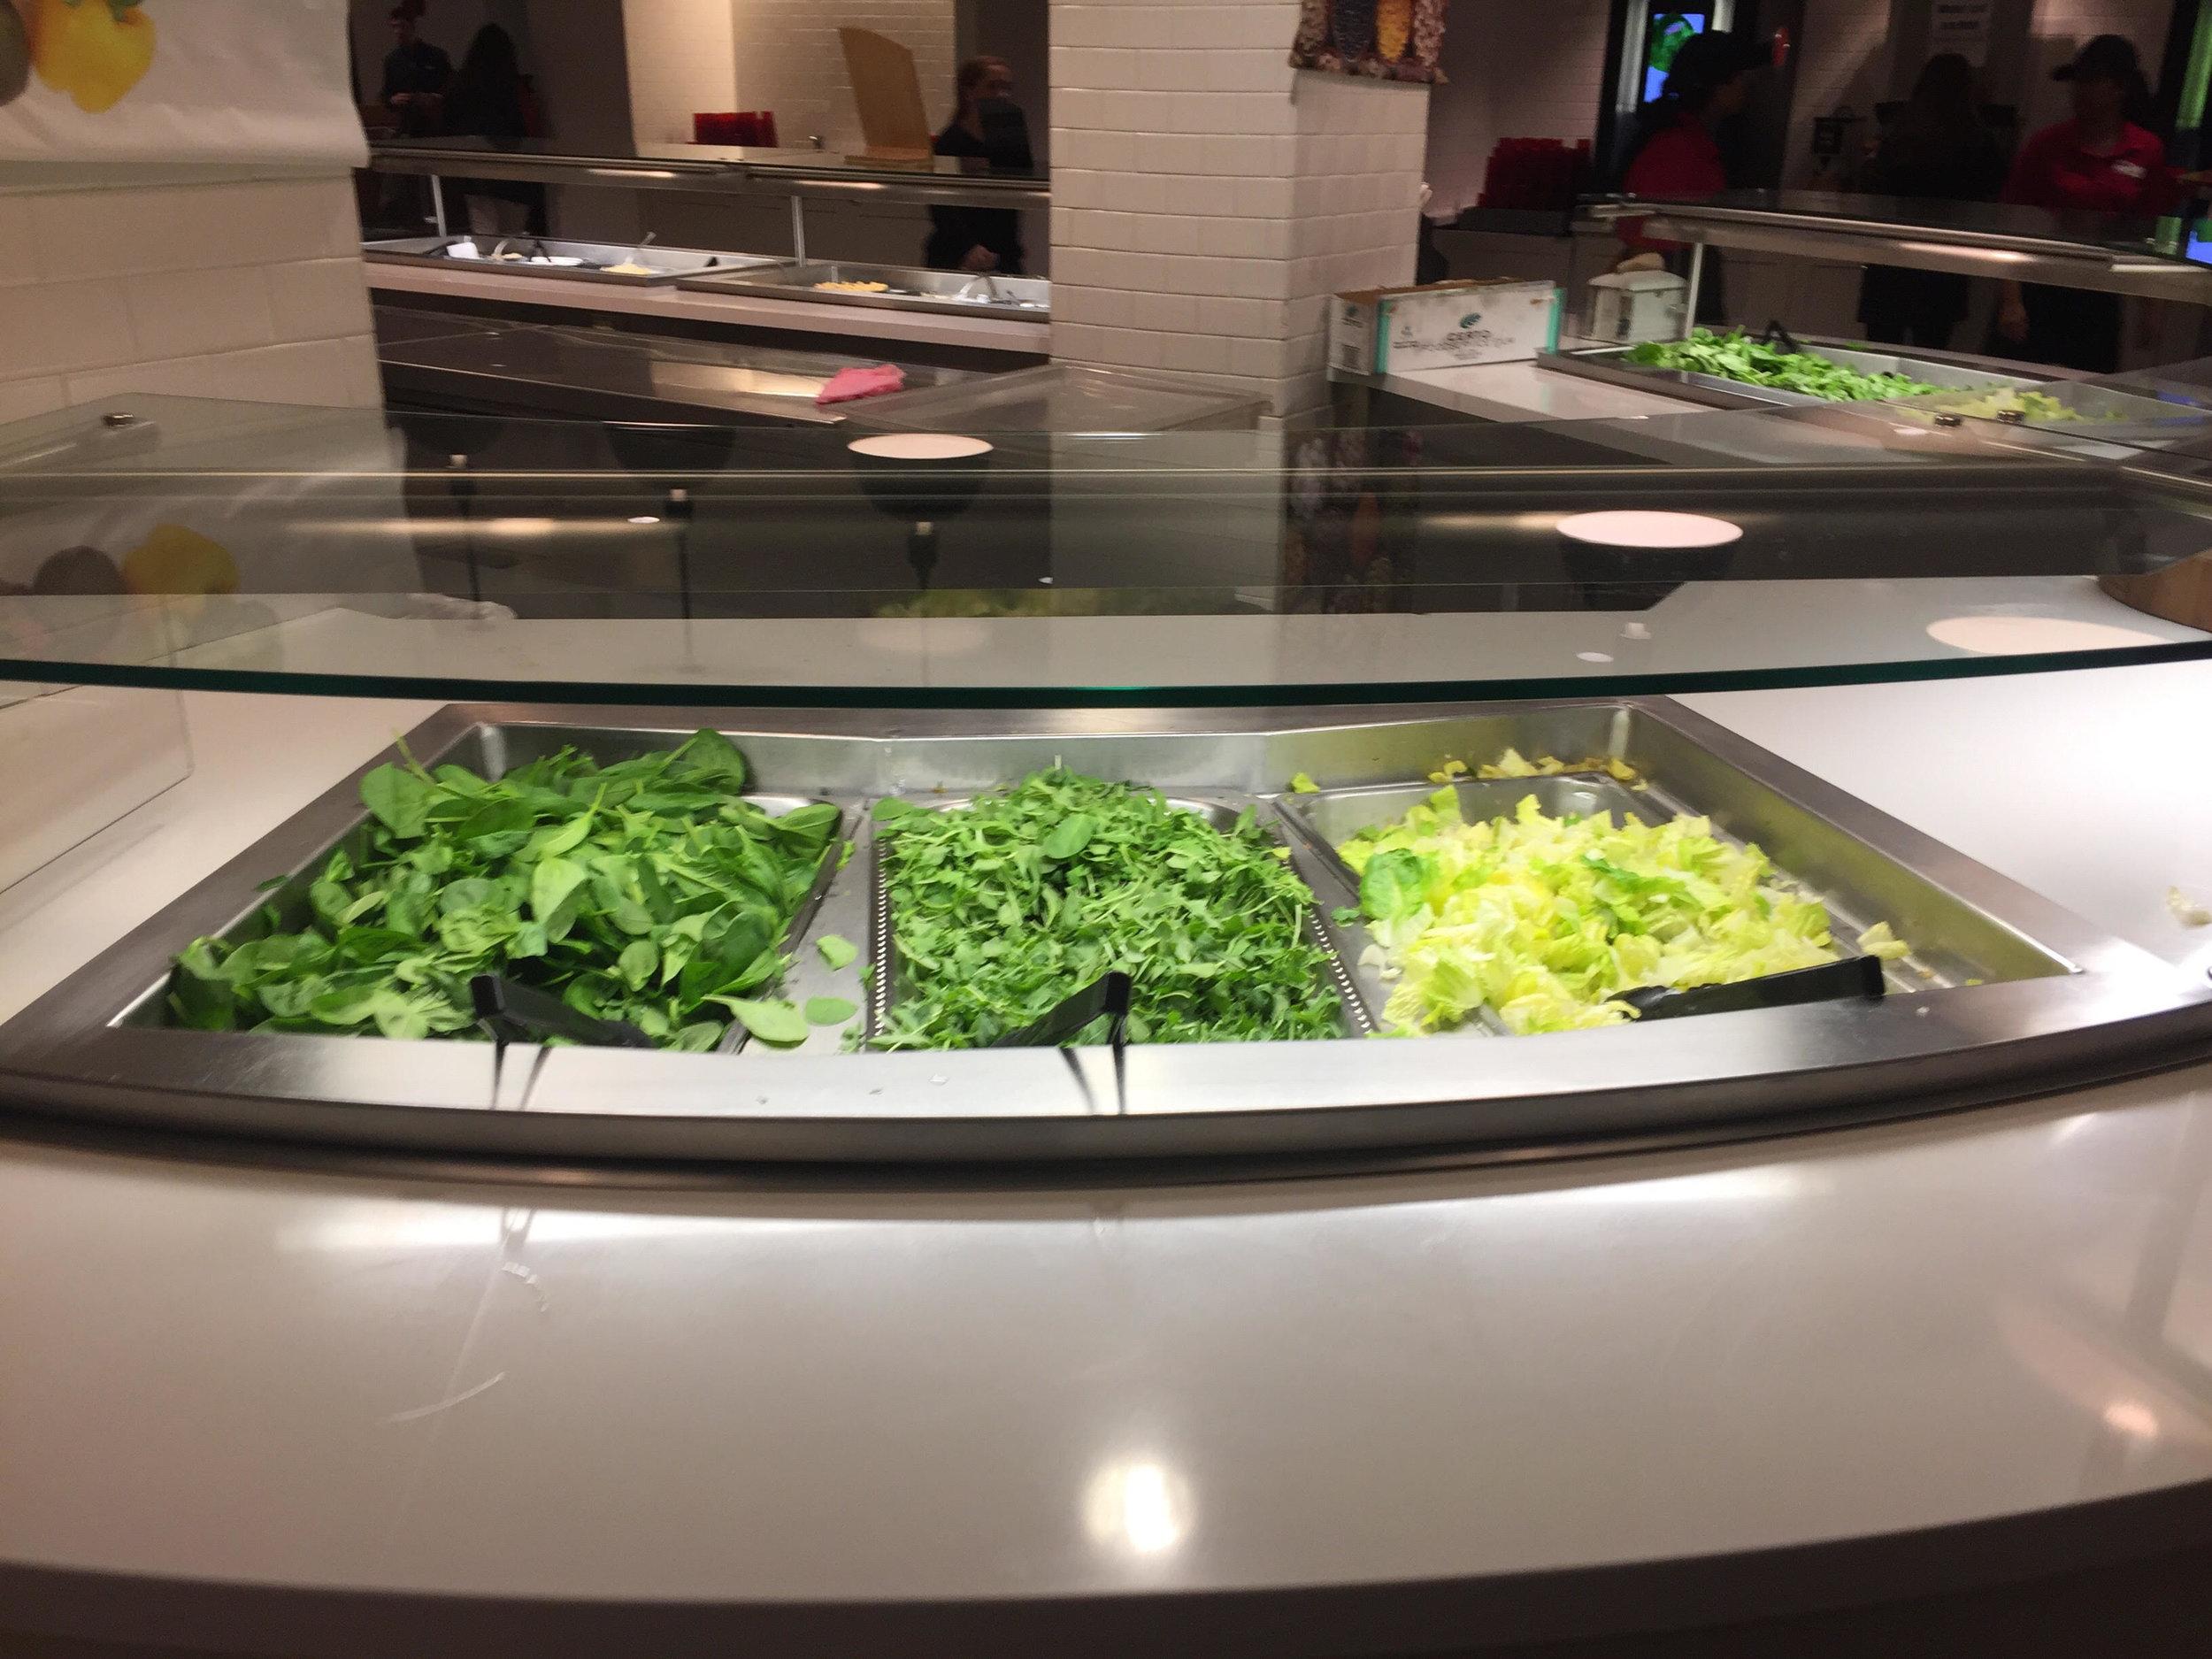 The Marist salad bar.